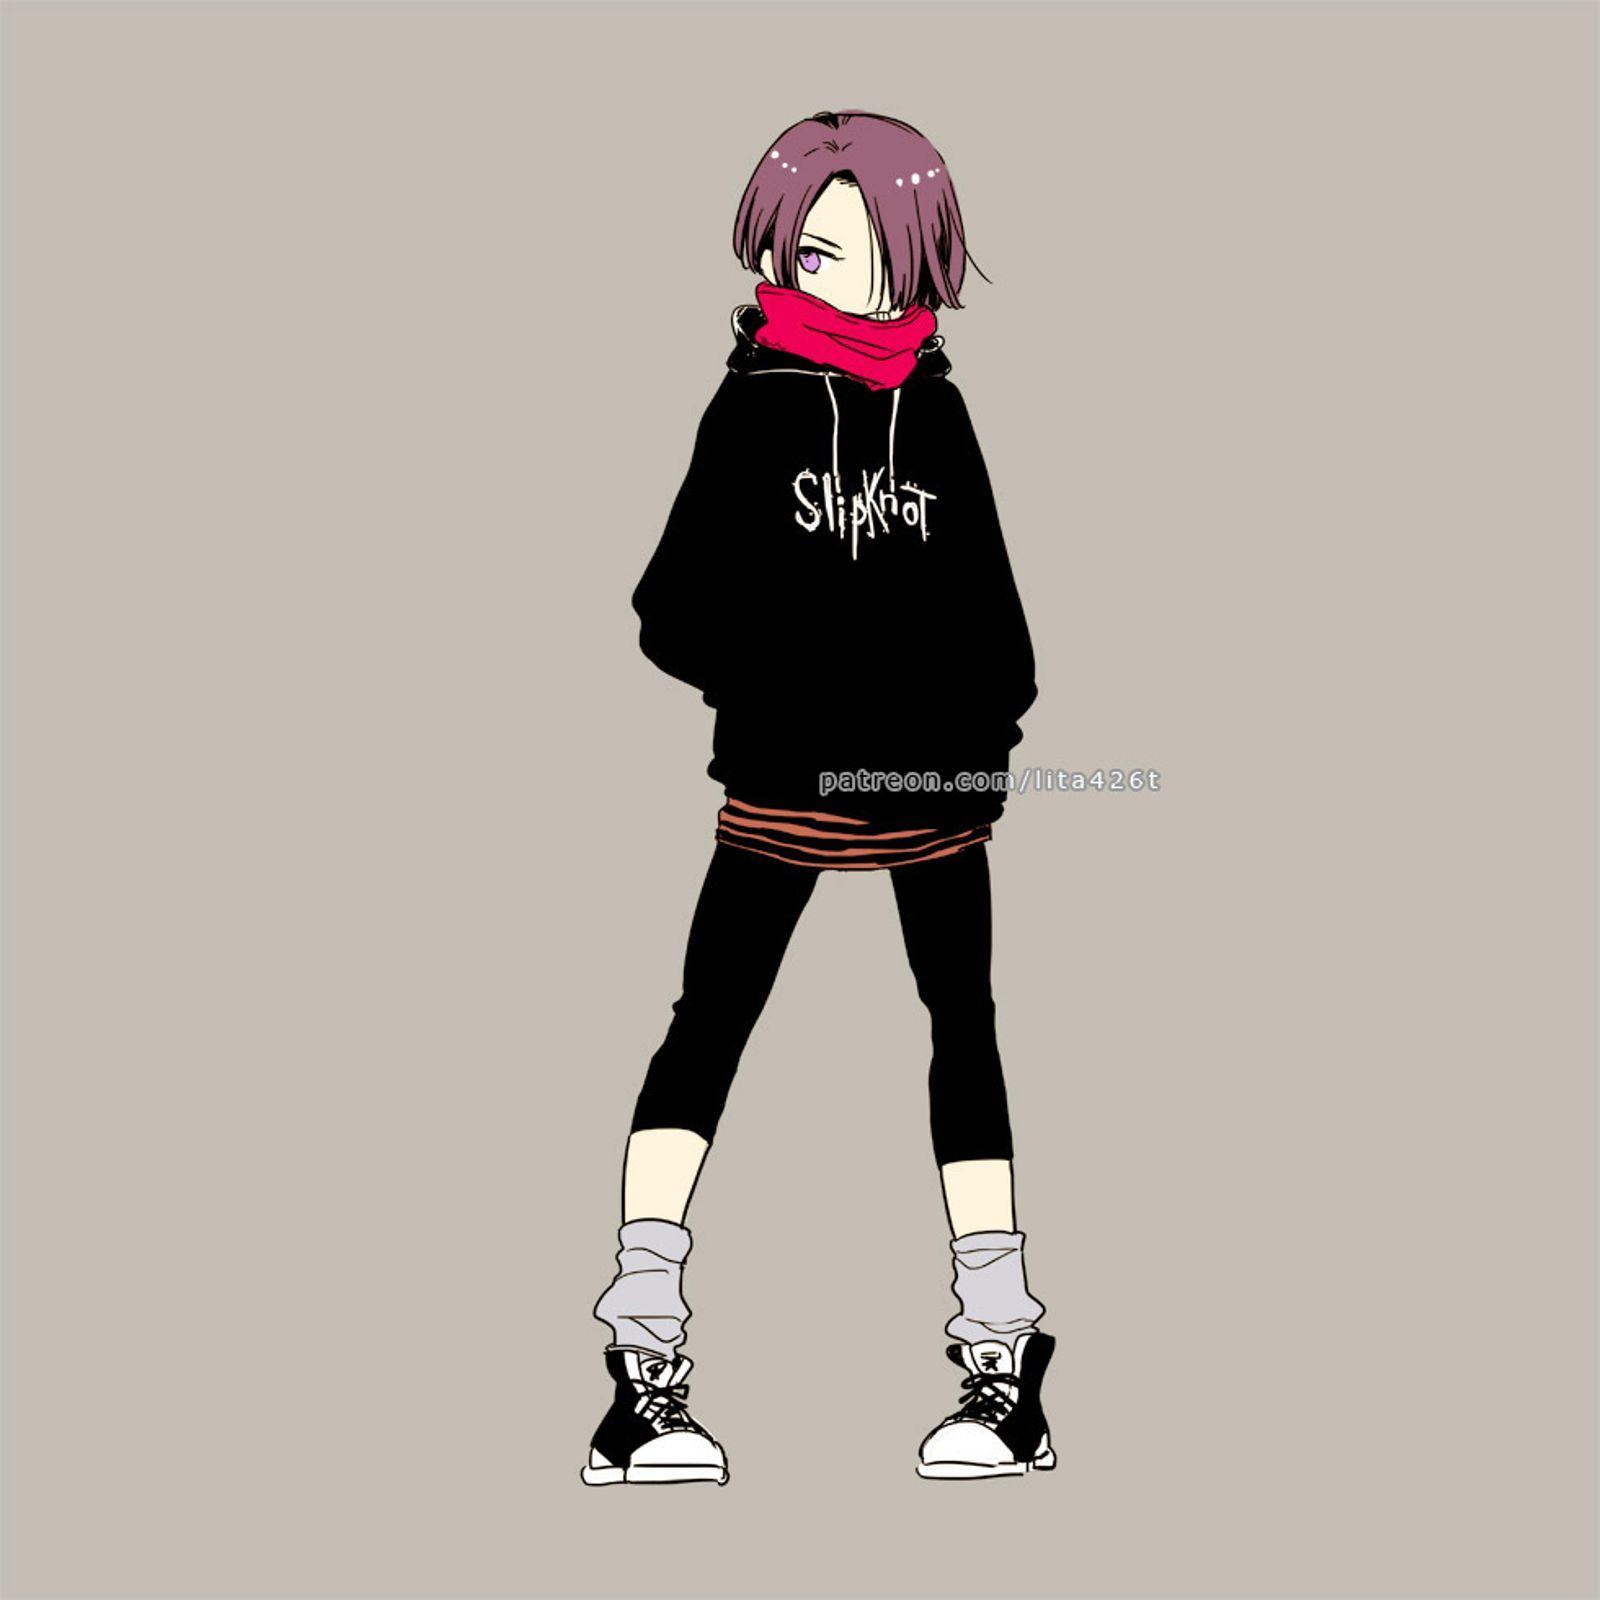 slipknot 20171220 | Tachibana Lita on Patreon